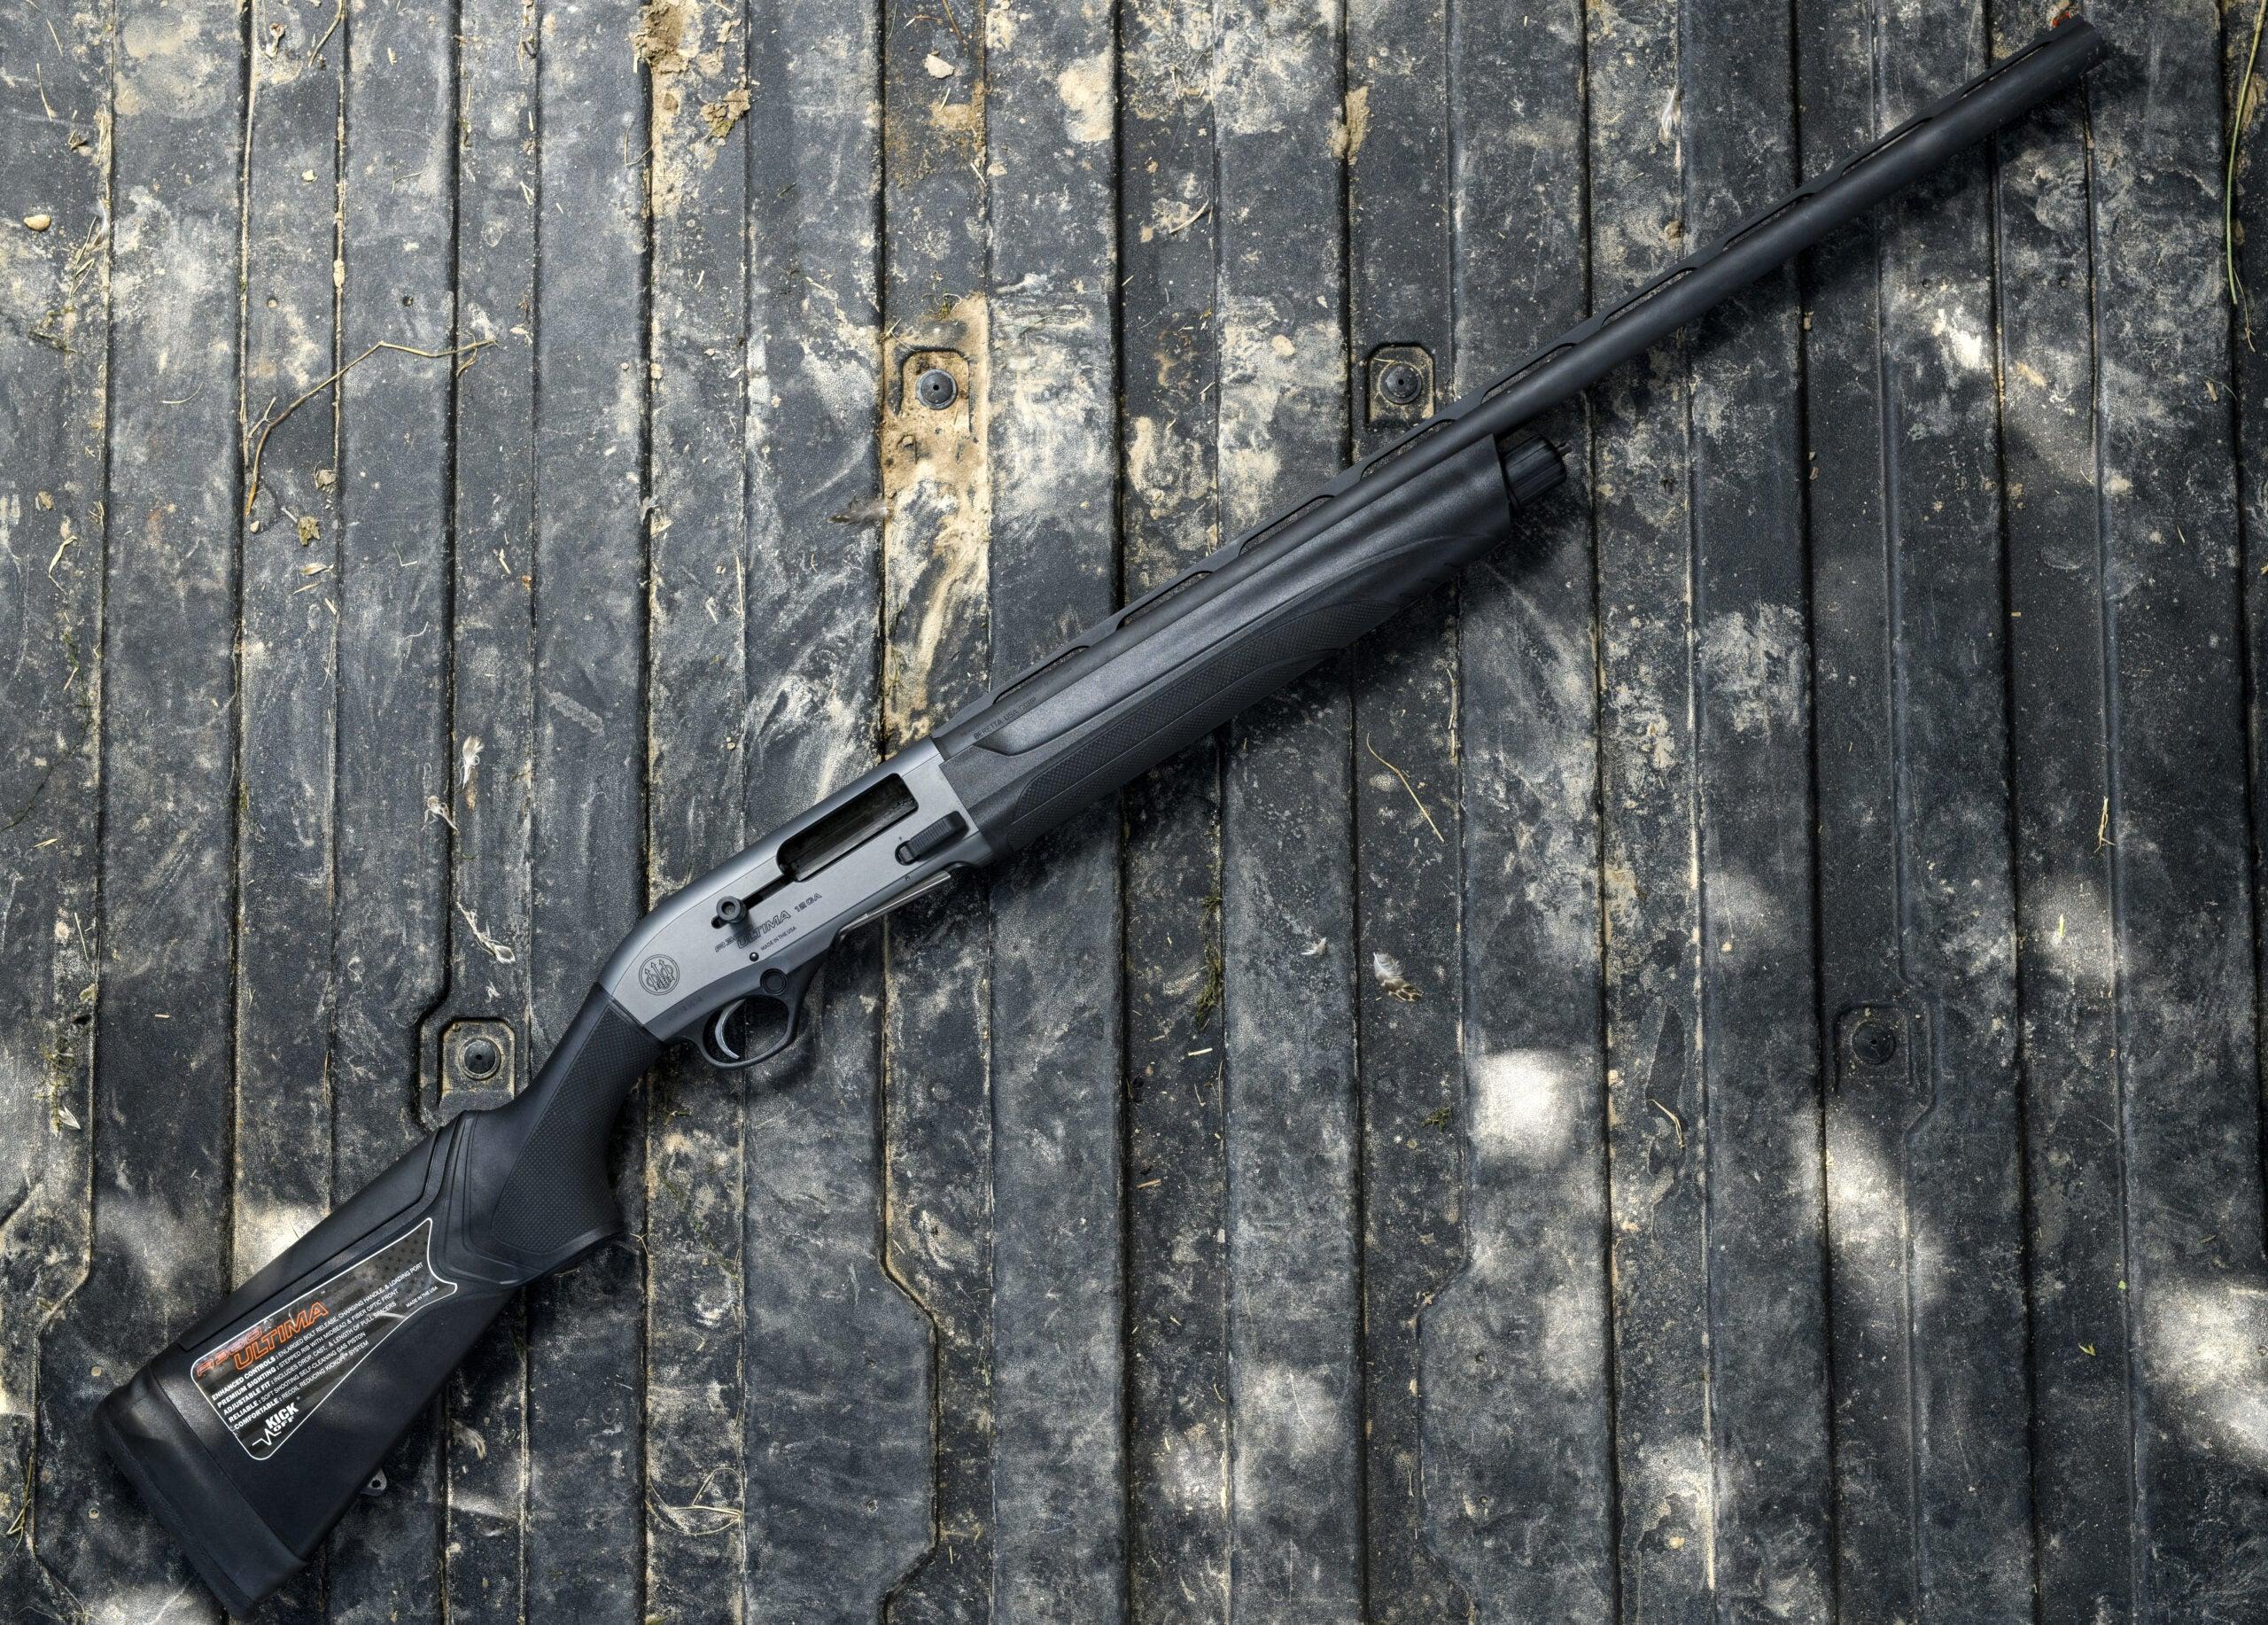 Beretta A300 is the best duck hunting shotgun.